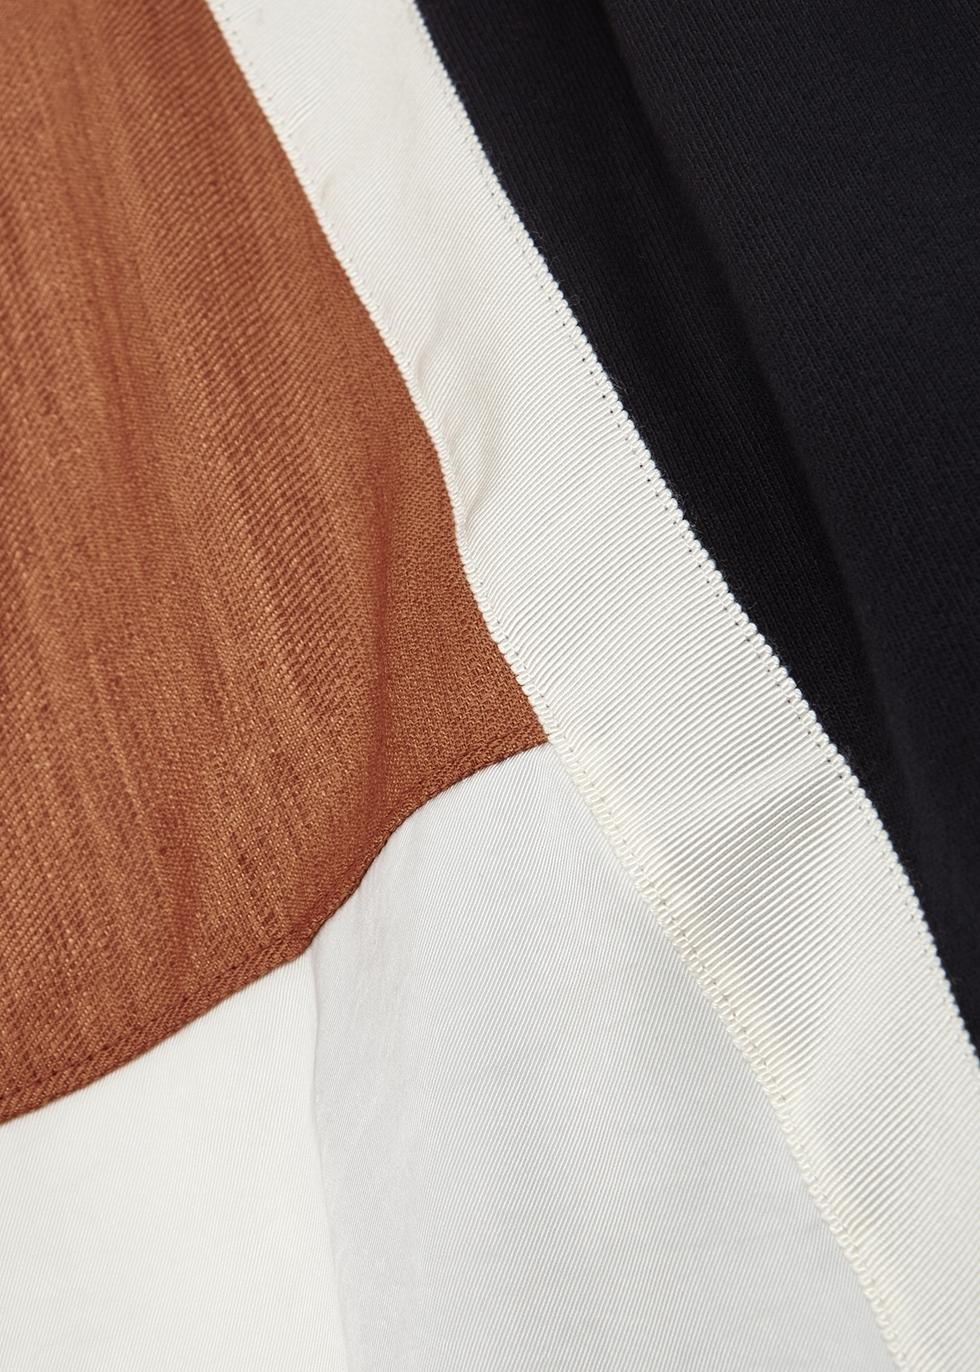 Mondrian navy cotton T-shirt - Clu